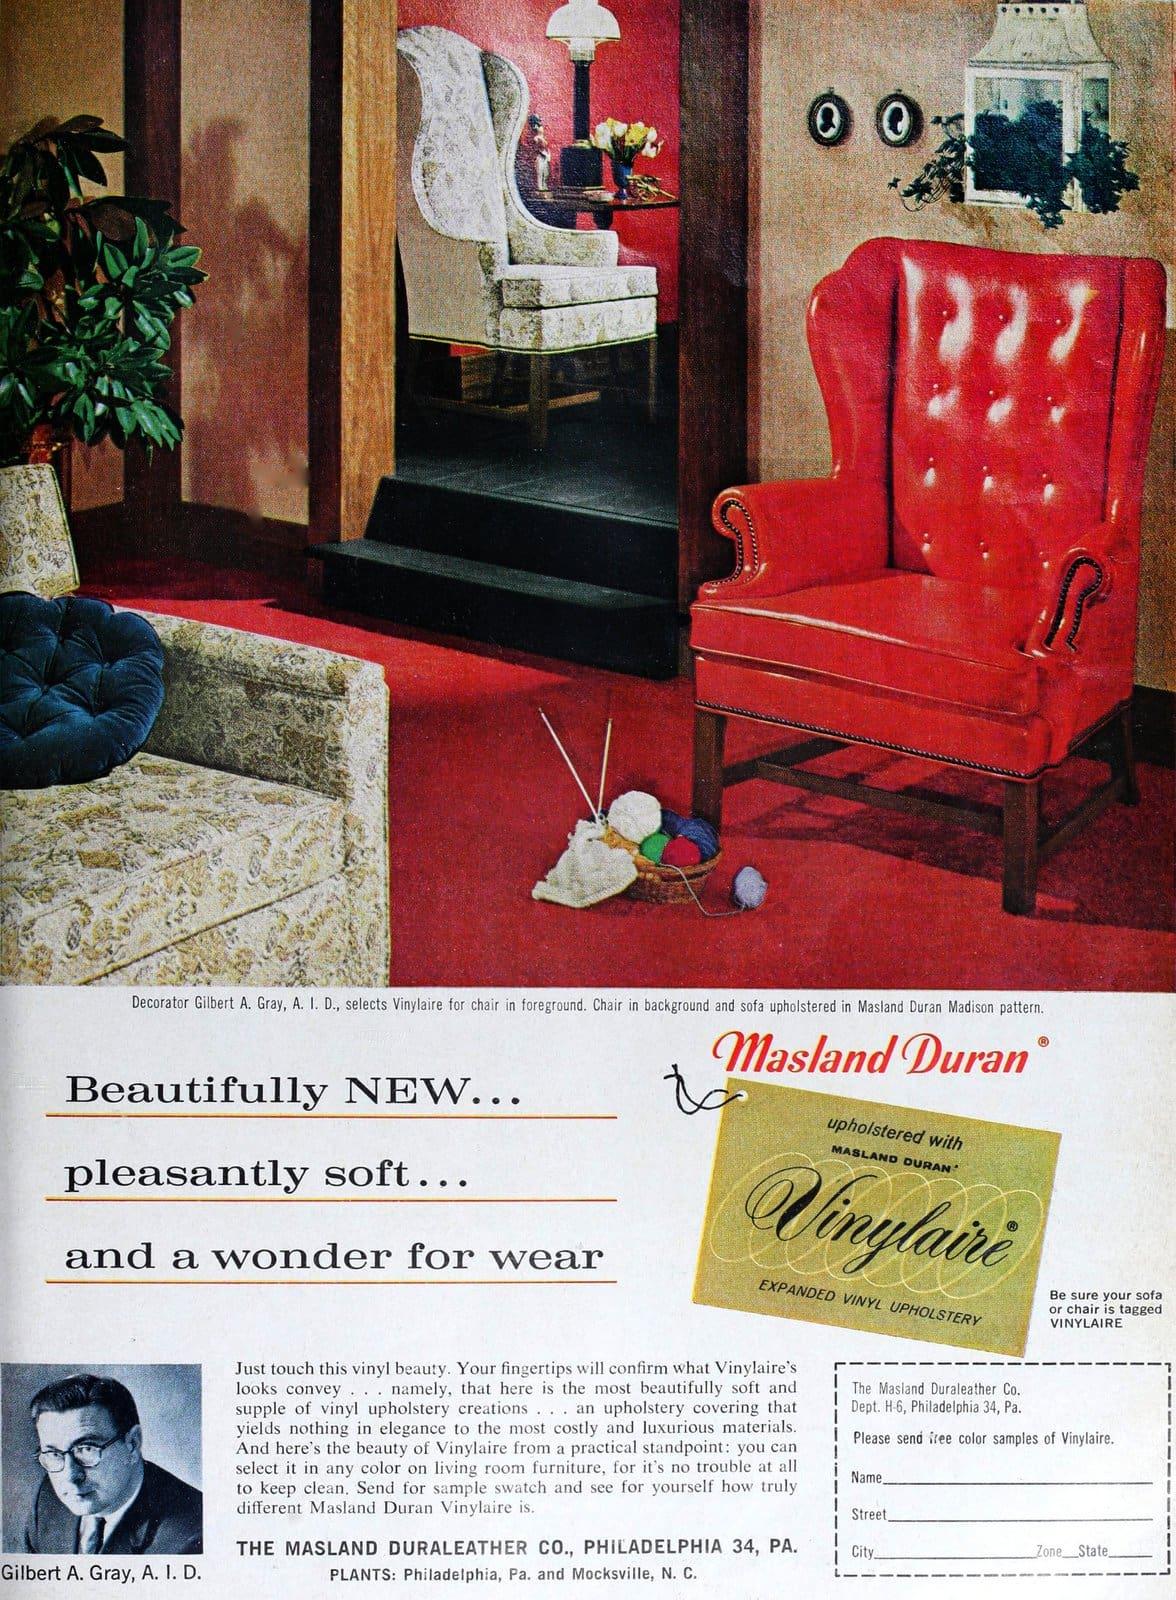 Retro red vinyl wingback chair (1962)